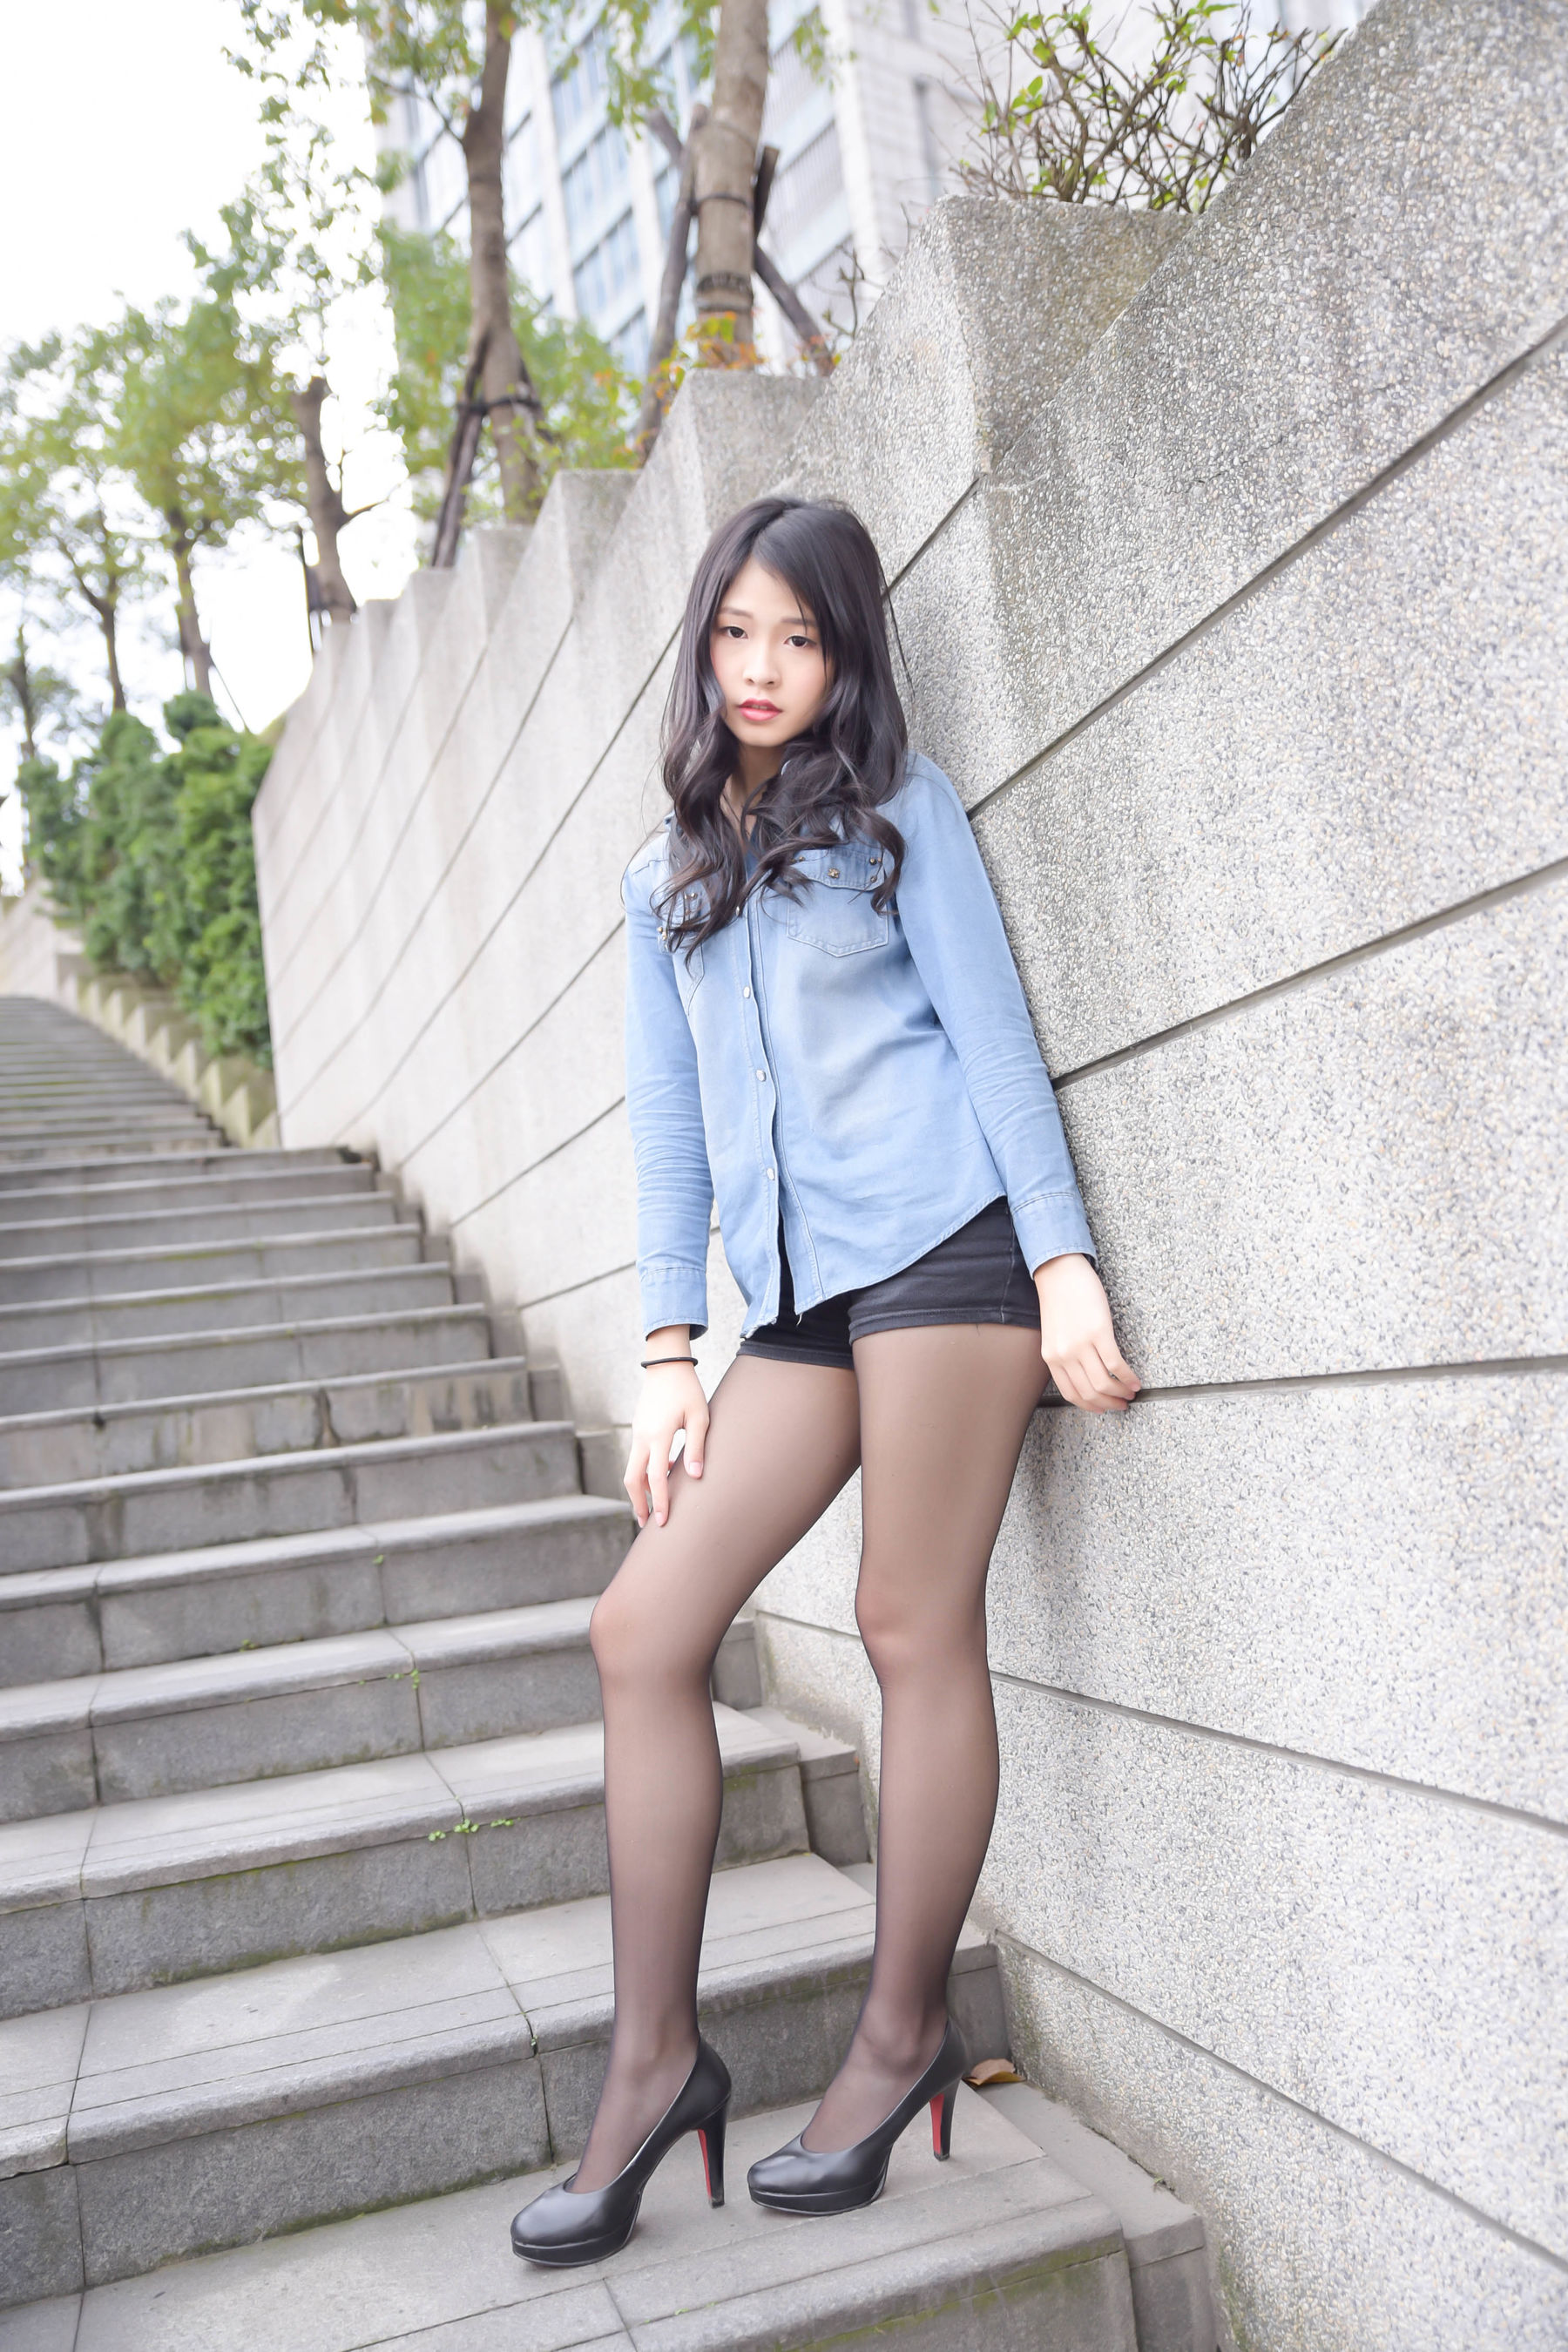 VOL.1930 [台湾正妹]美腿街拍黑丝软妹:小枫超高清个人性感漂亮大图(94P)